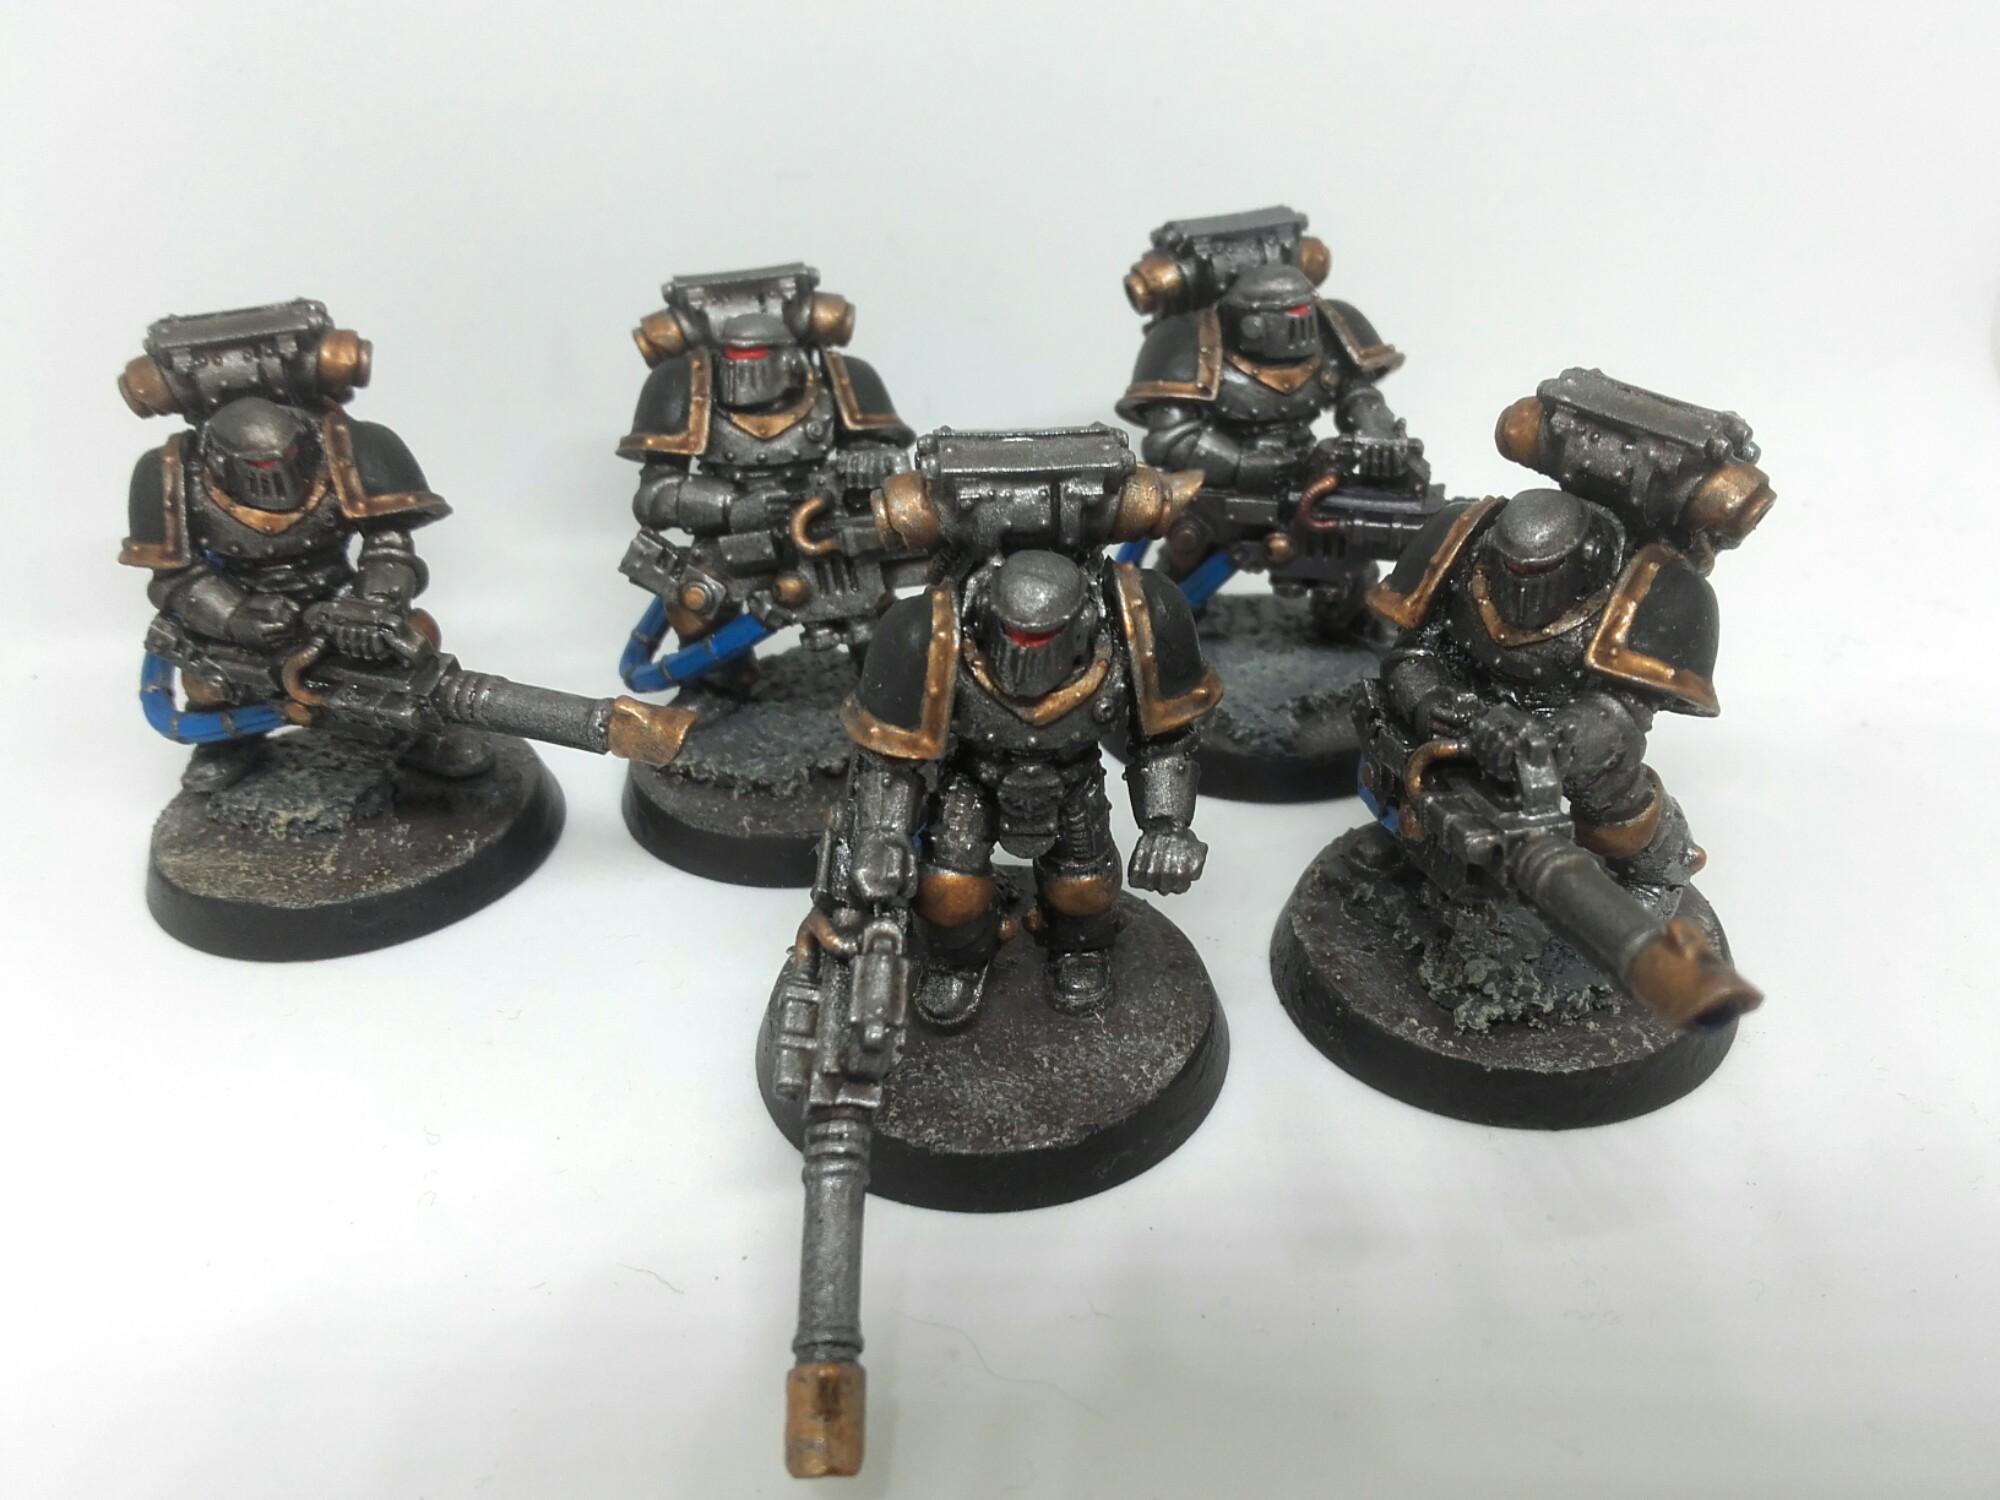 Iron havocs with lascannons